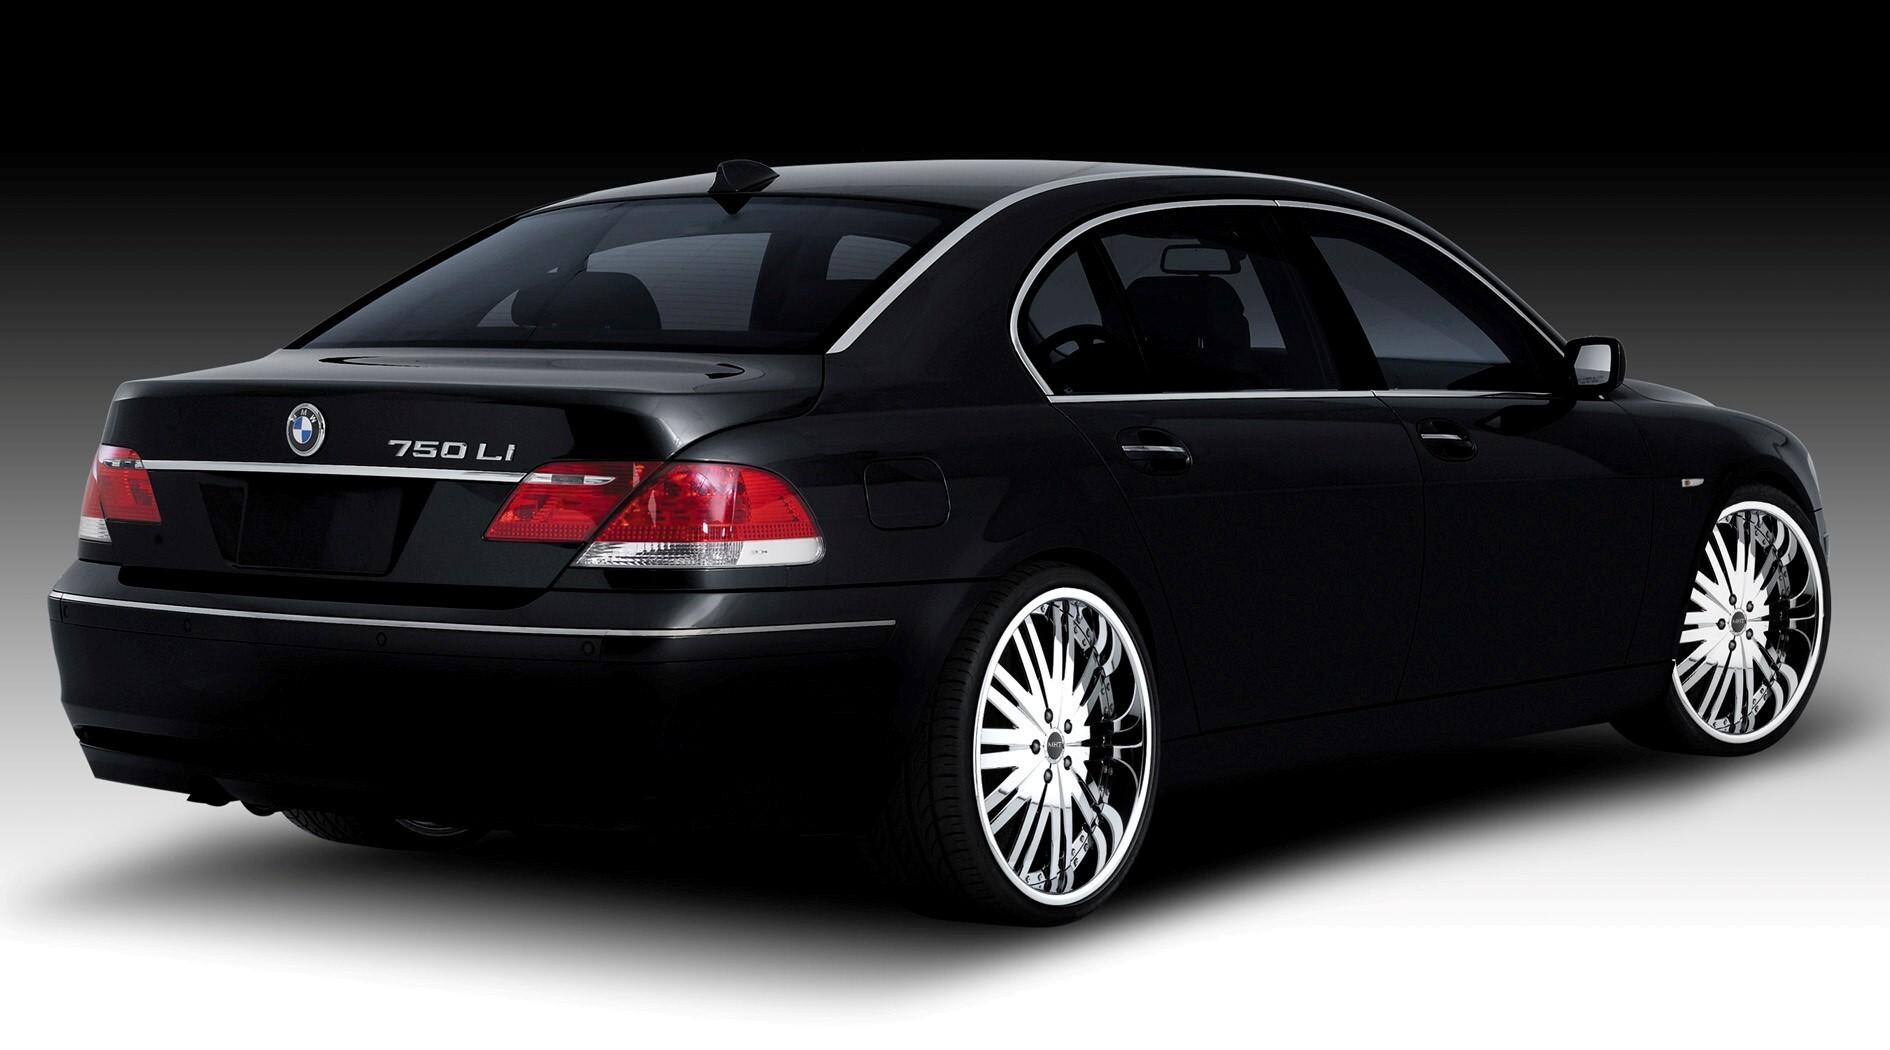 Black BMW 7 Series Car Wallpapers | HD Wallpapers